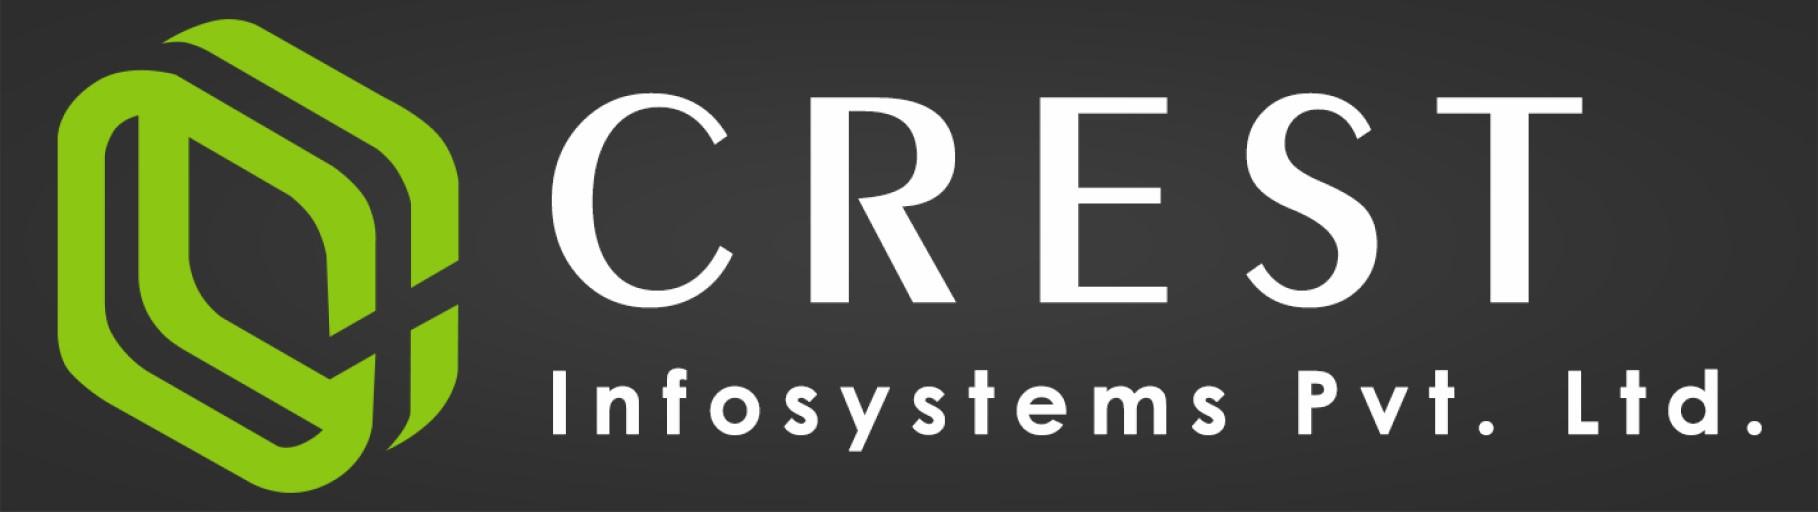 Crest Infosystems Pvt. Ltd. logo